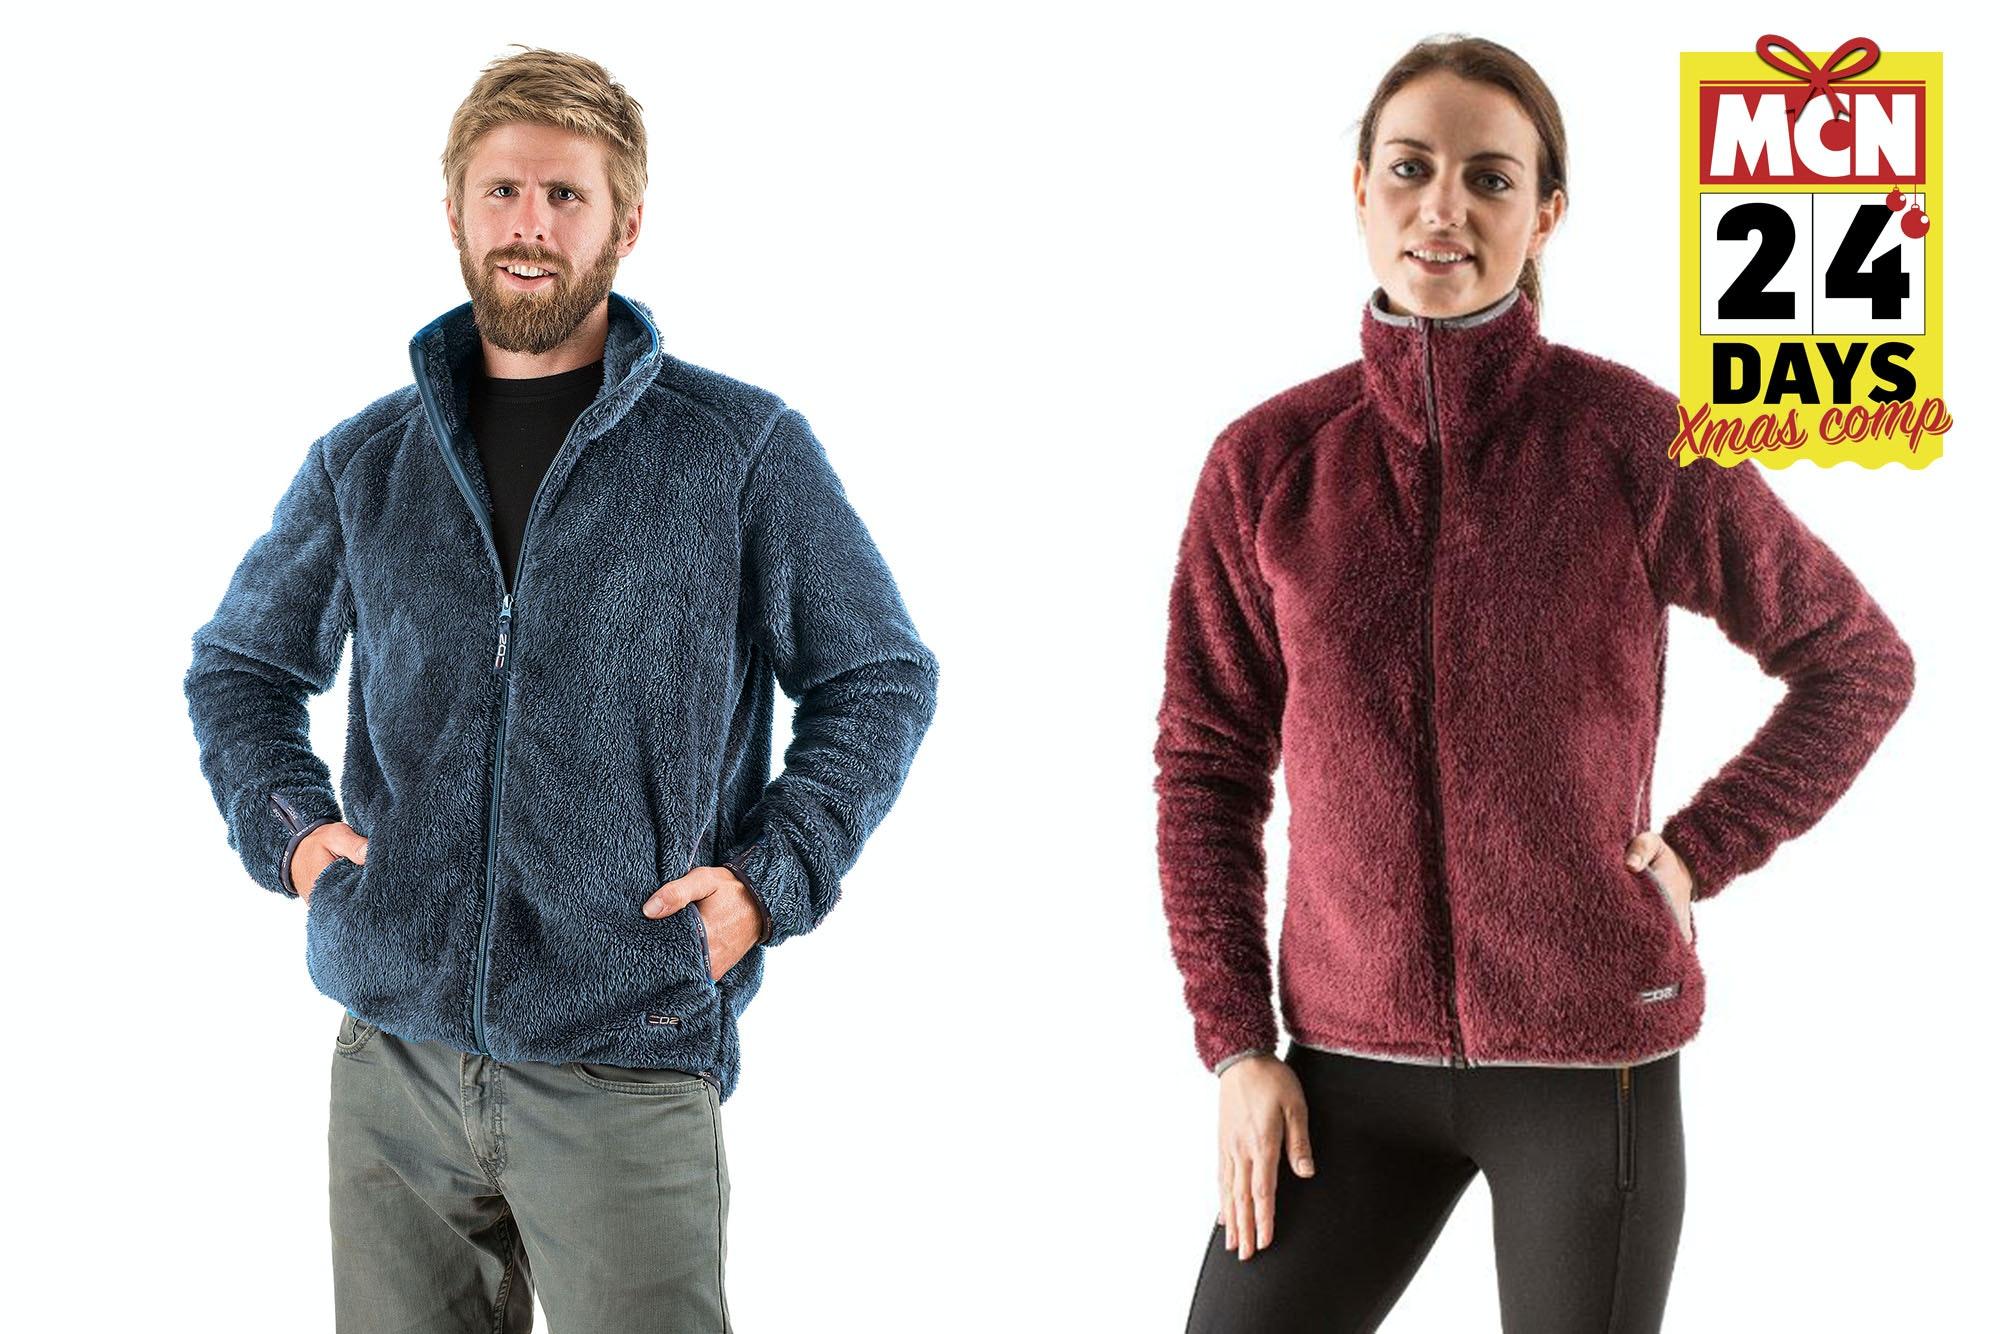 Dress up warm in this EDZ Yeti Fleece sweepstakes